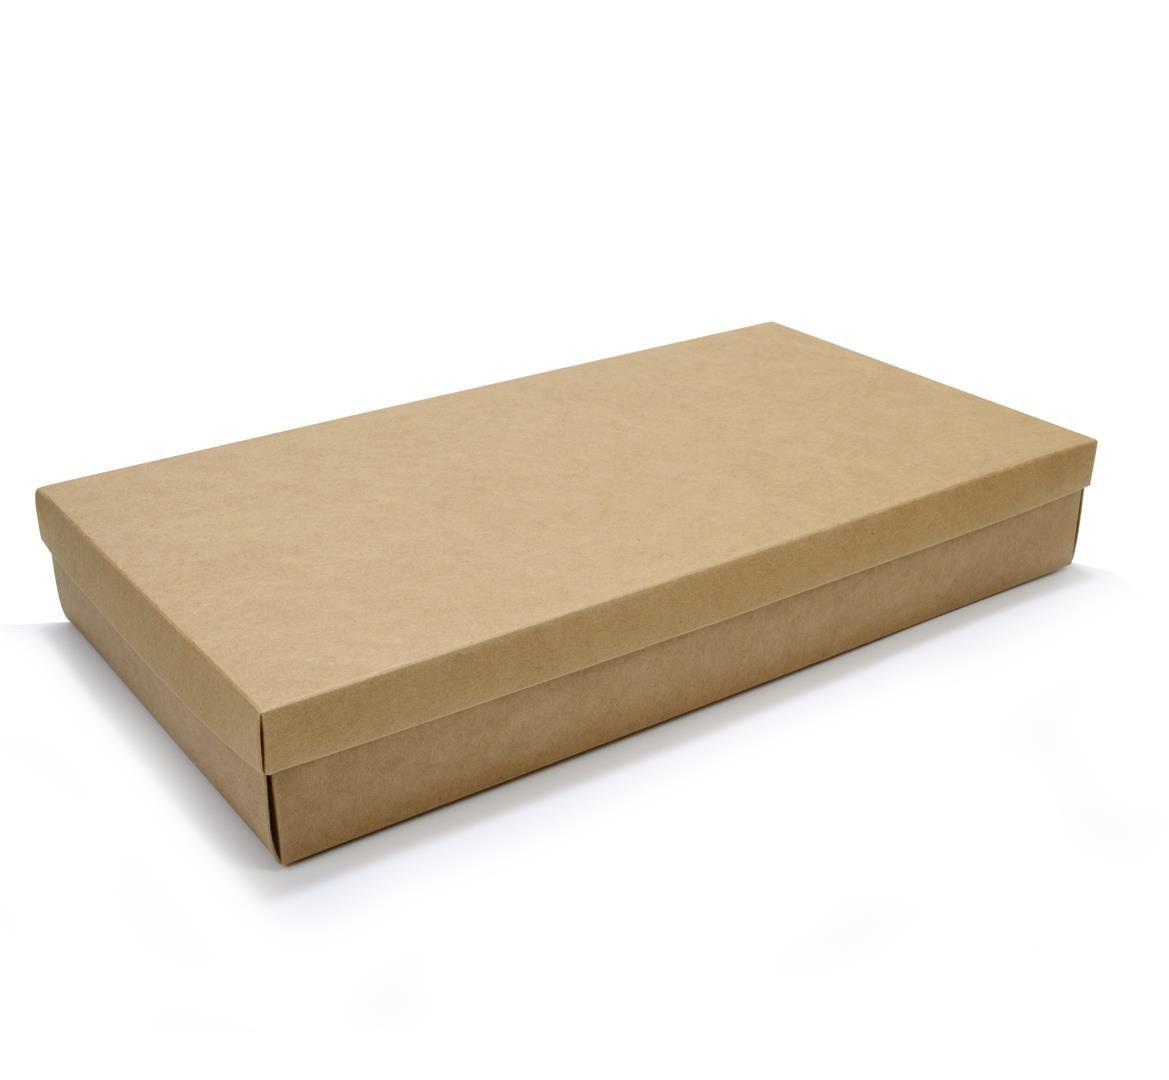 Ref 132 Kraft Alta - Caixa c/ tampa papel - 43x23x6,5 cm - c/ 10 unidades